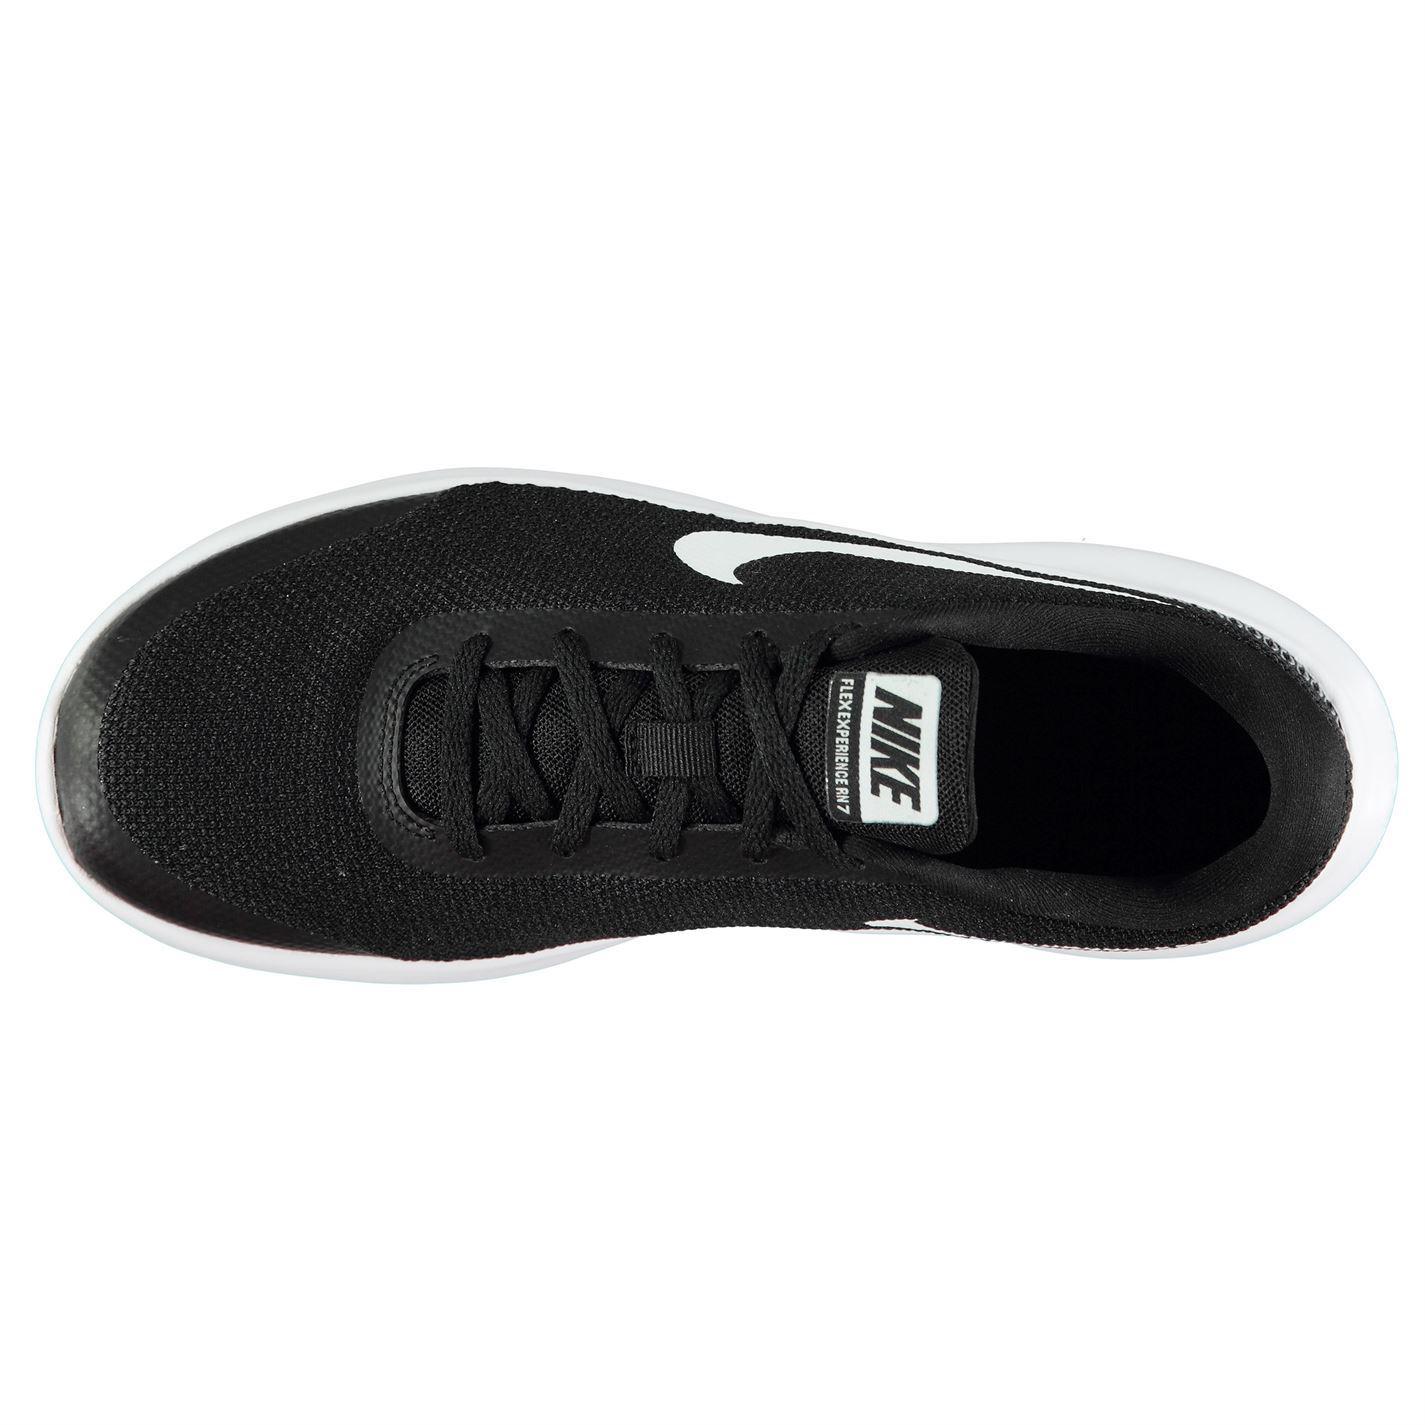 902adb9adf2cc ... Nike Flex Experience 7 Trainers Mens Black White Athletic Sneakers Shoes